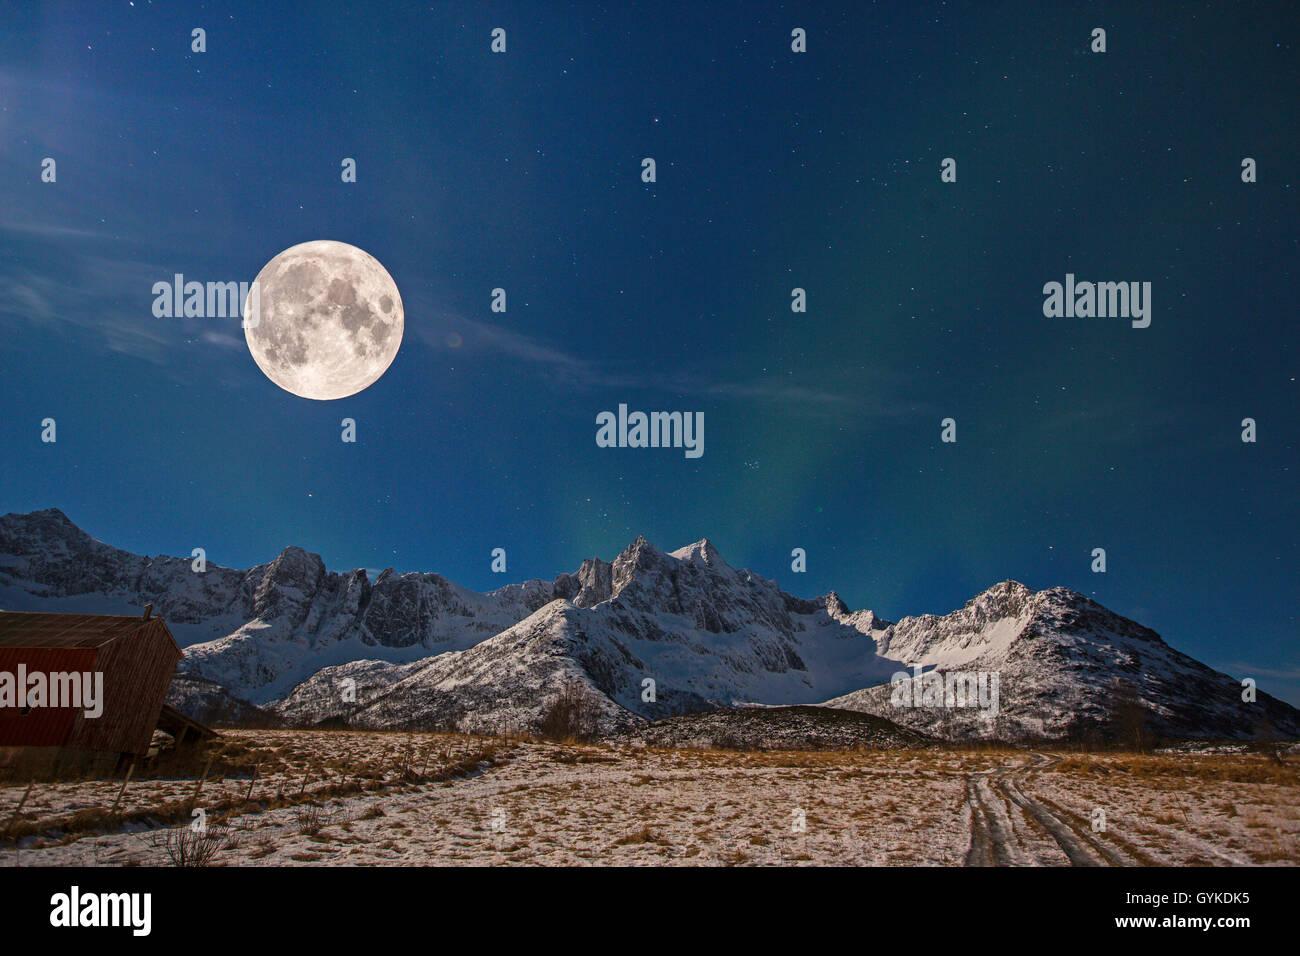 Vollmond mit Sternenhimmel und Nordlicht ueber Bergkette, Norwegen, Troms, Senja   full moon with starry sky and - Stock Image